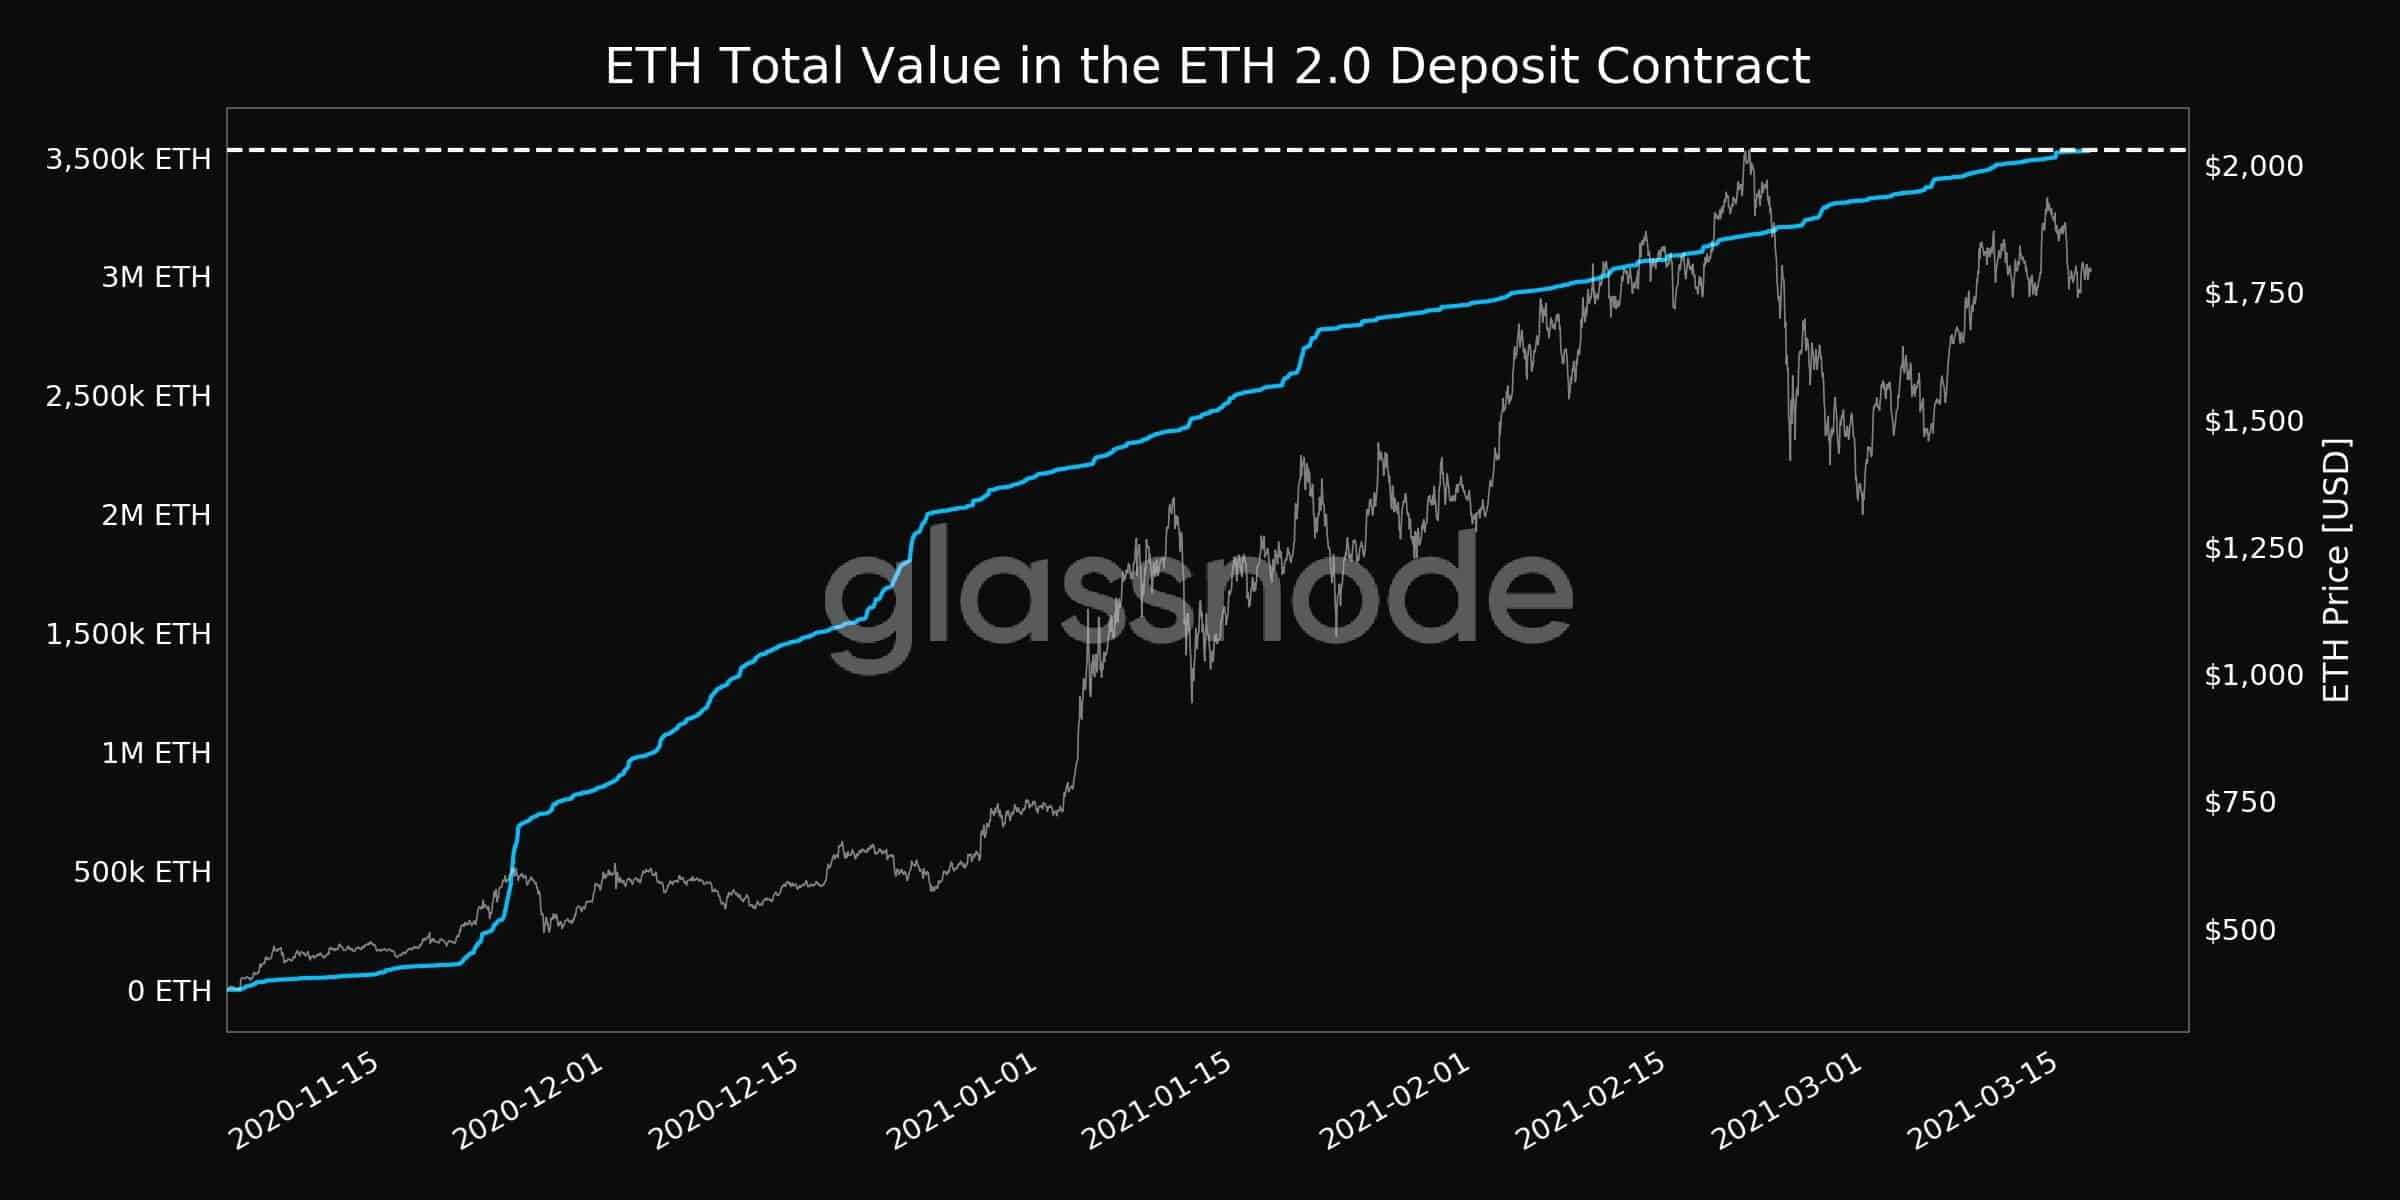 ETH Value Locked in Ethereum 2.0 Deposit Contract. Source: Glassnode